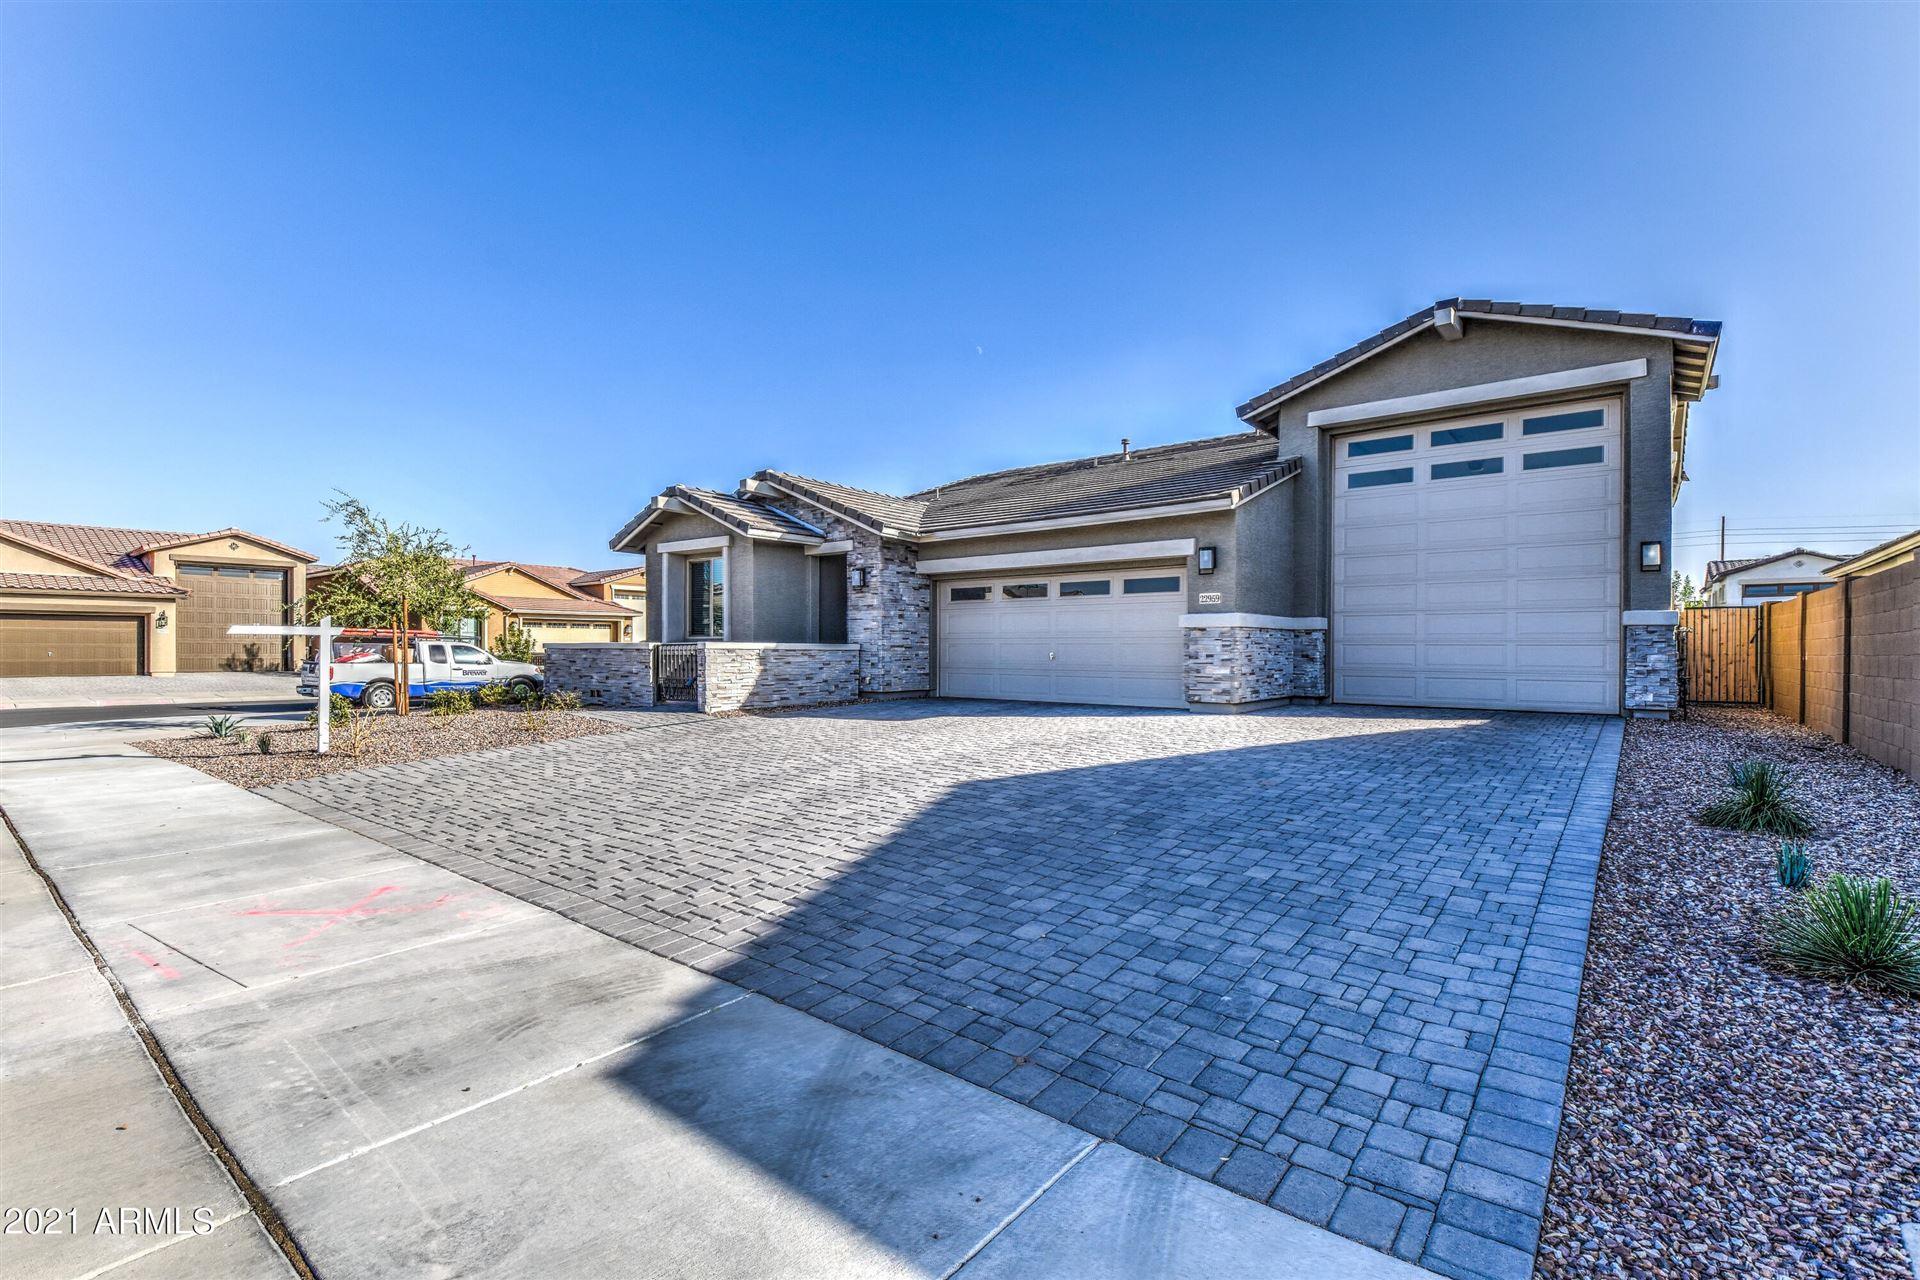 Photo of 22959 E DOMINGO Road, Queen Creek, AZ 85142 (MLS # 6307237)